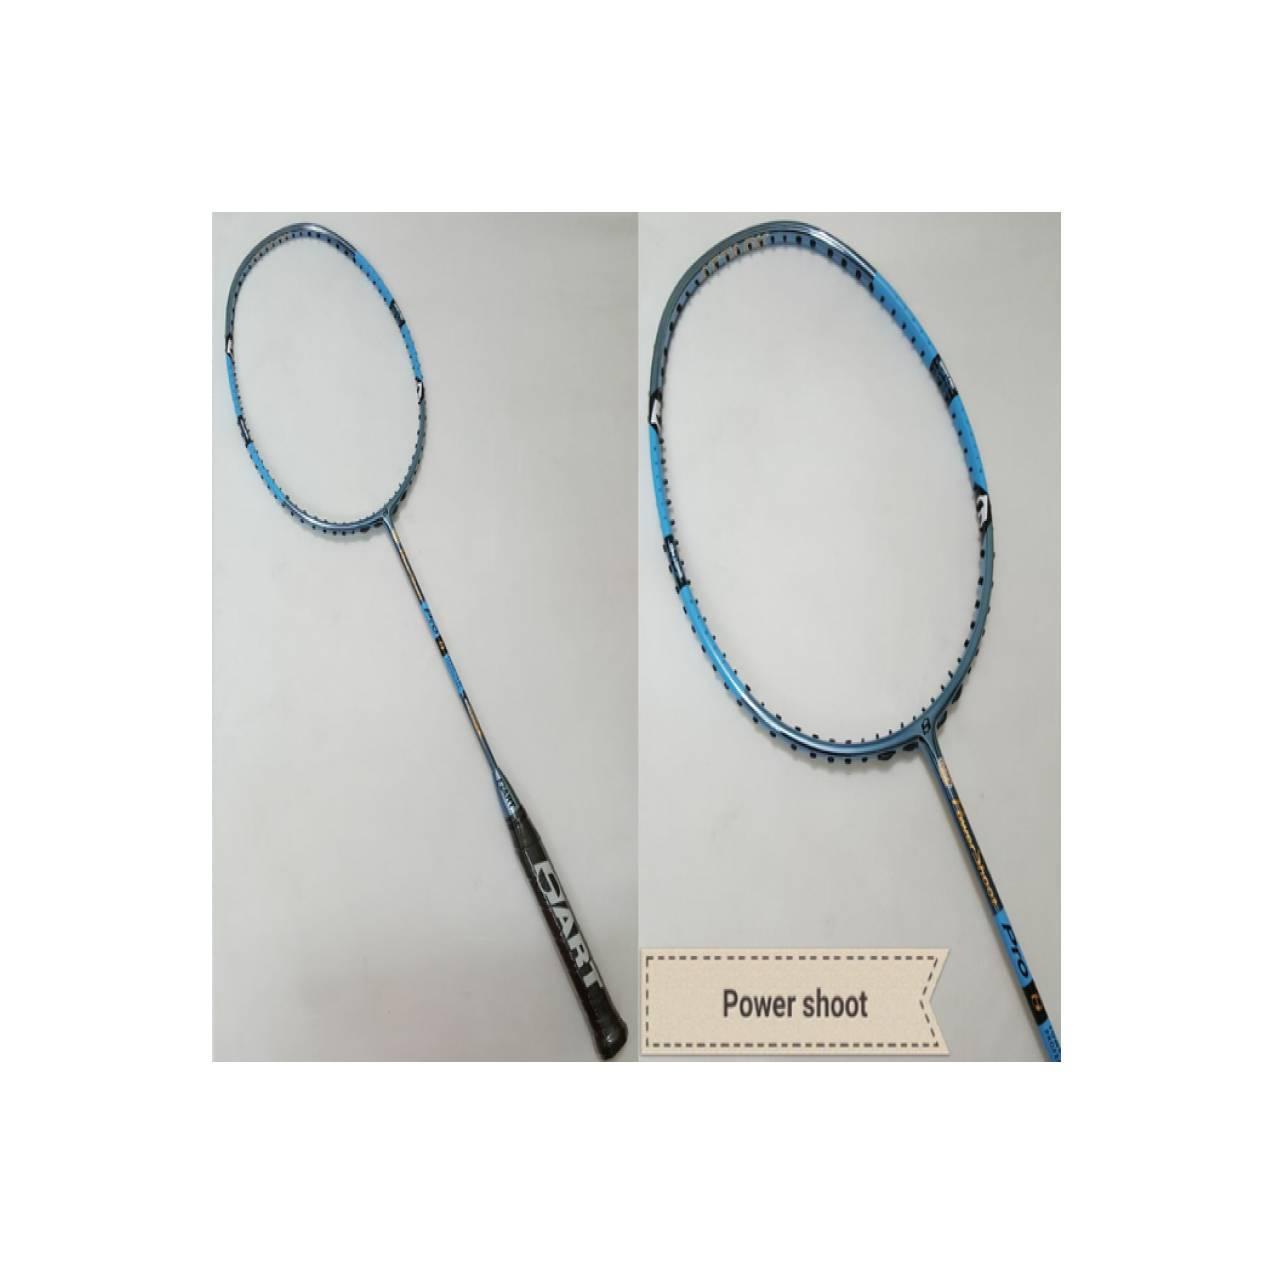 Kelebihan Raket Badminton Bulutangkis Hart Power Shoot New Original Morris Pro Pasang Senar Pa Dg66